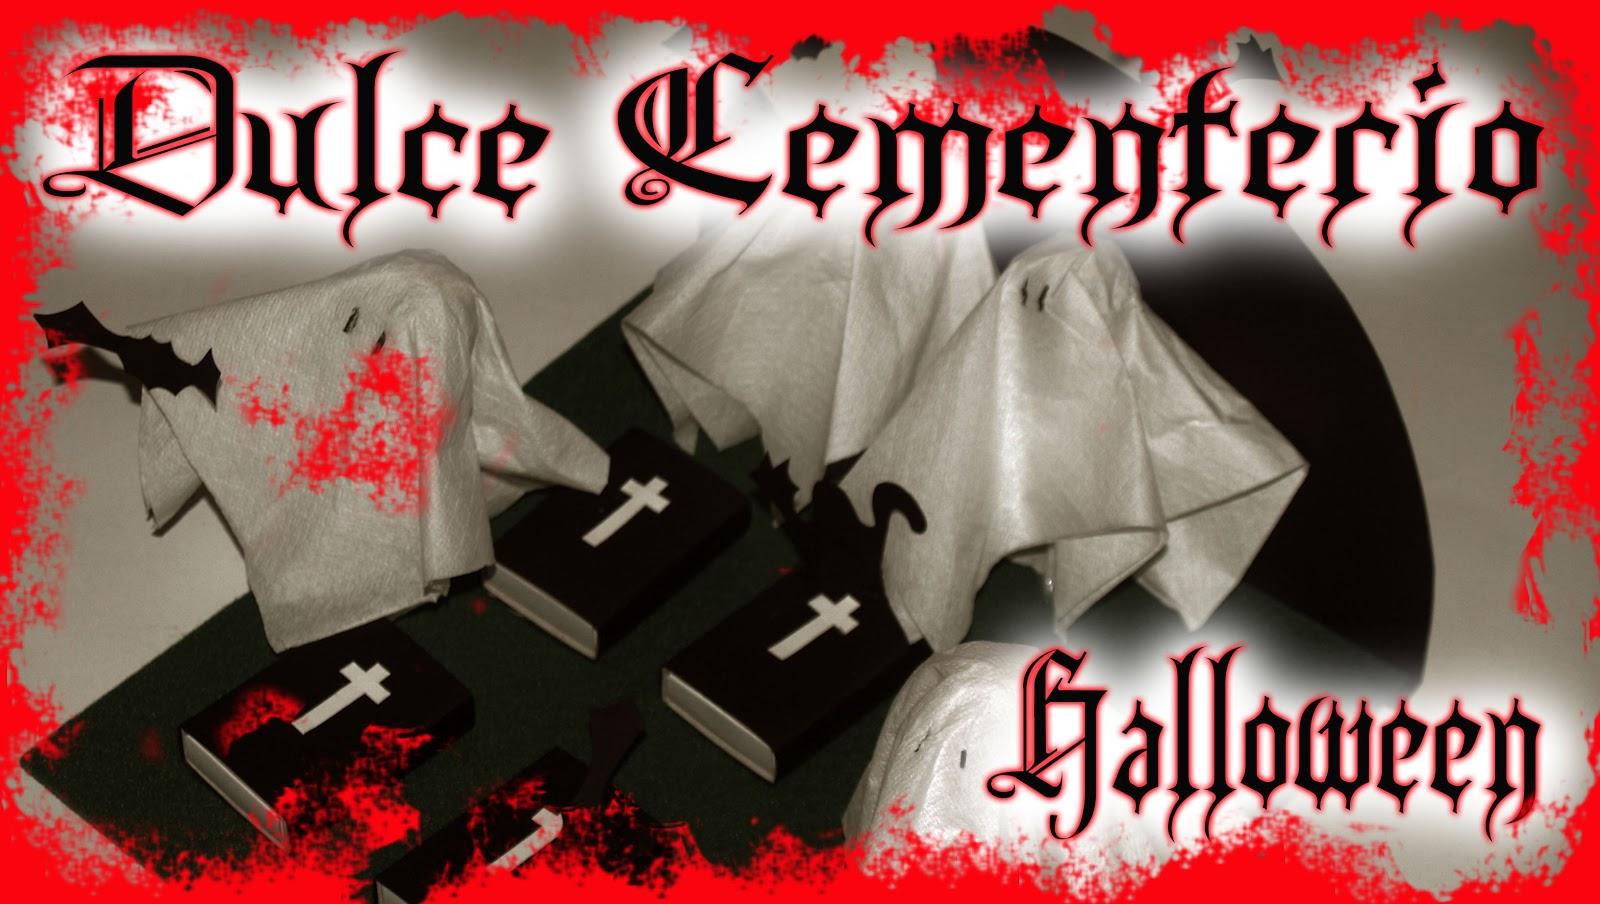 http://hazregalos.blogspot.co.uk/2012/10/halloween-dulce-cementerio.html